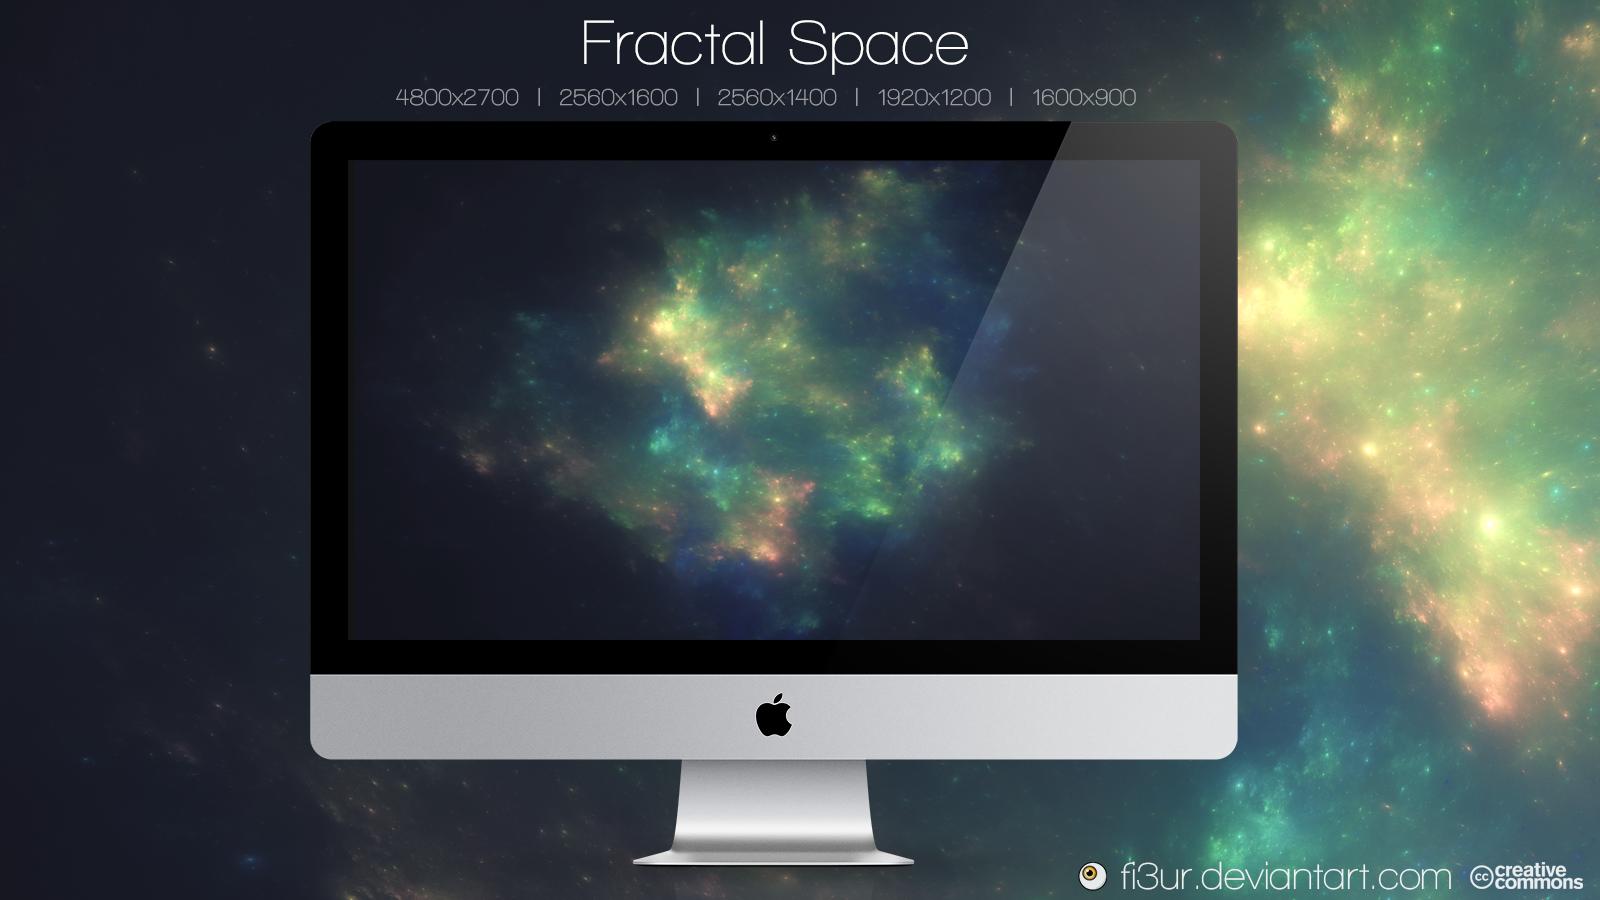 Fractal Space Wallpaper by Fi3uR